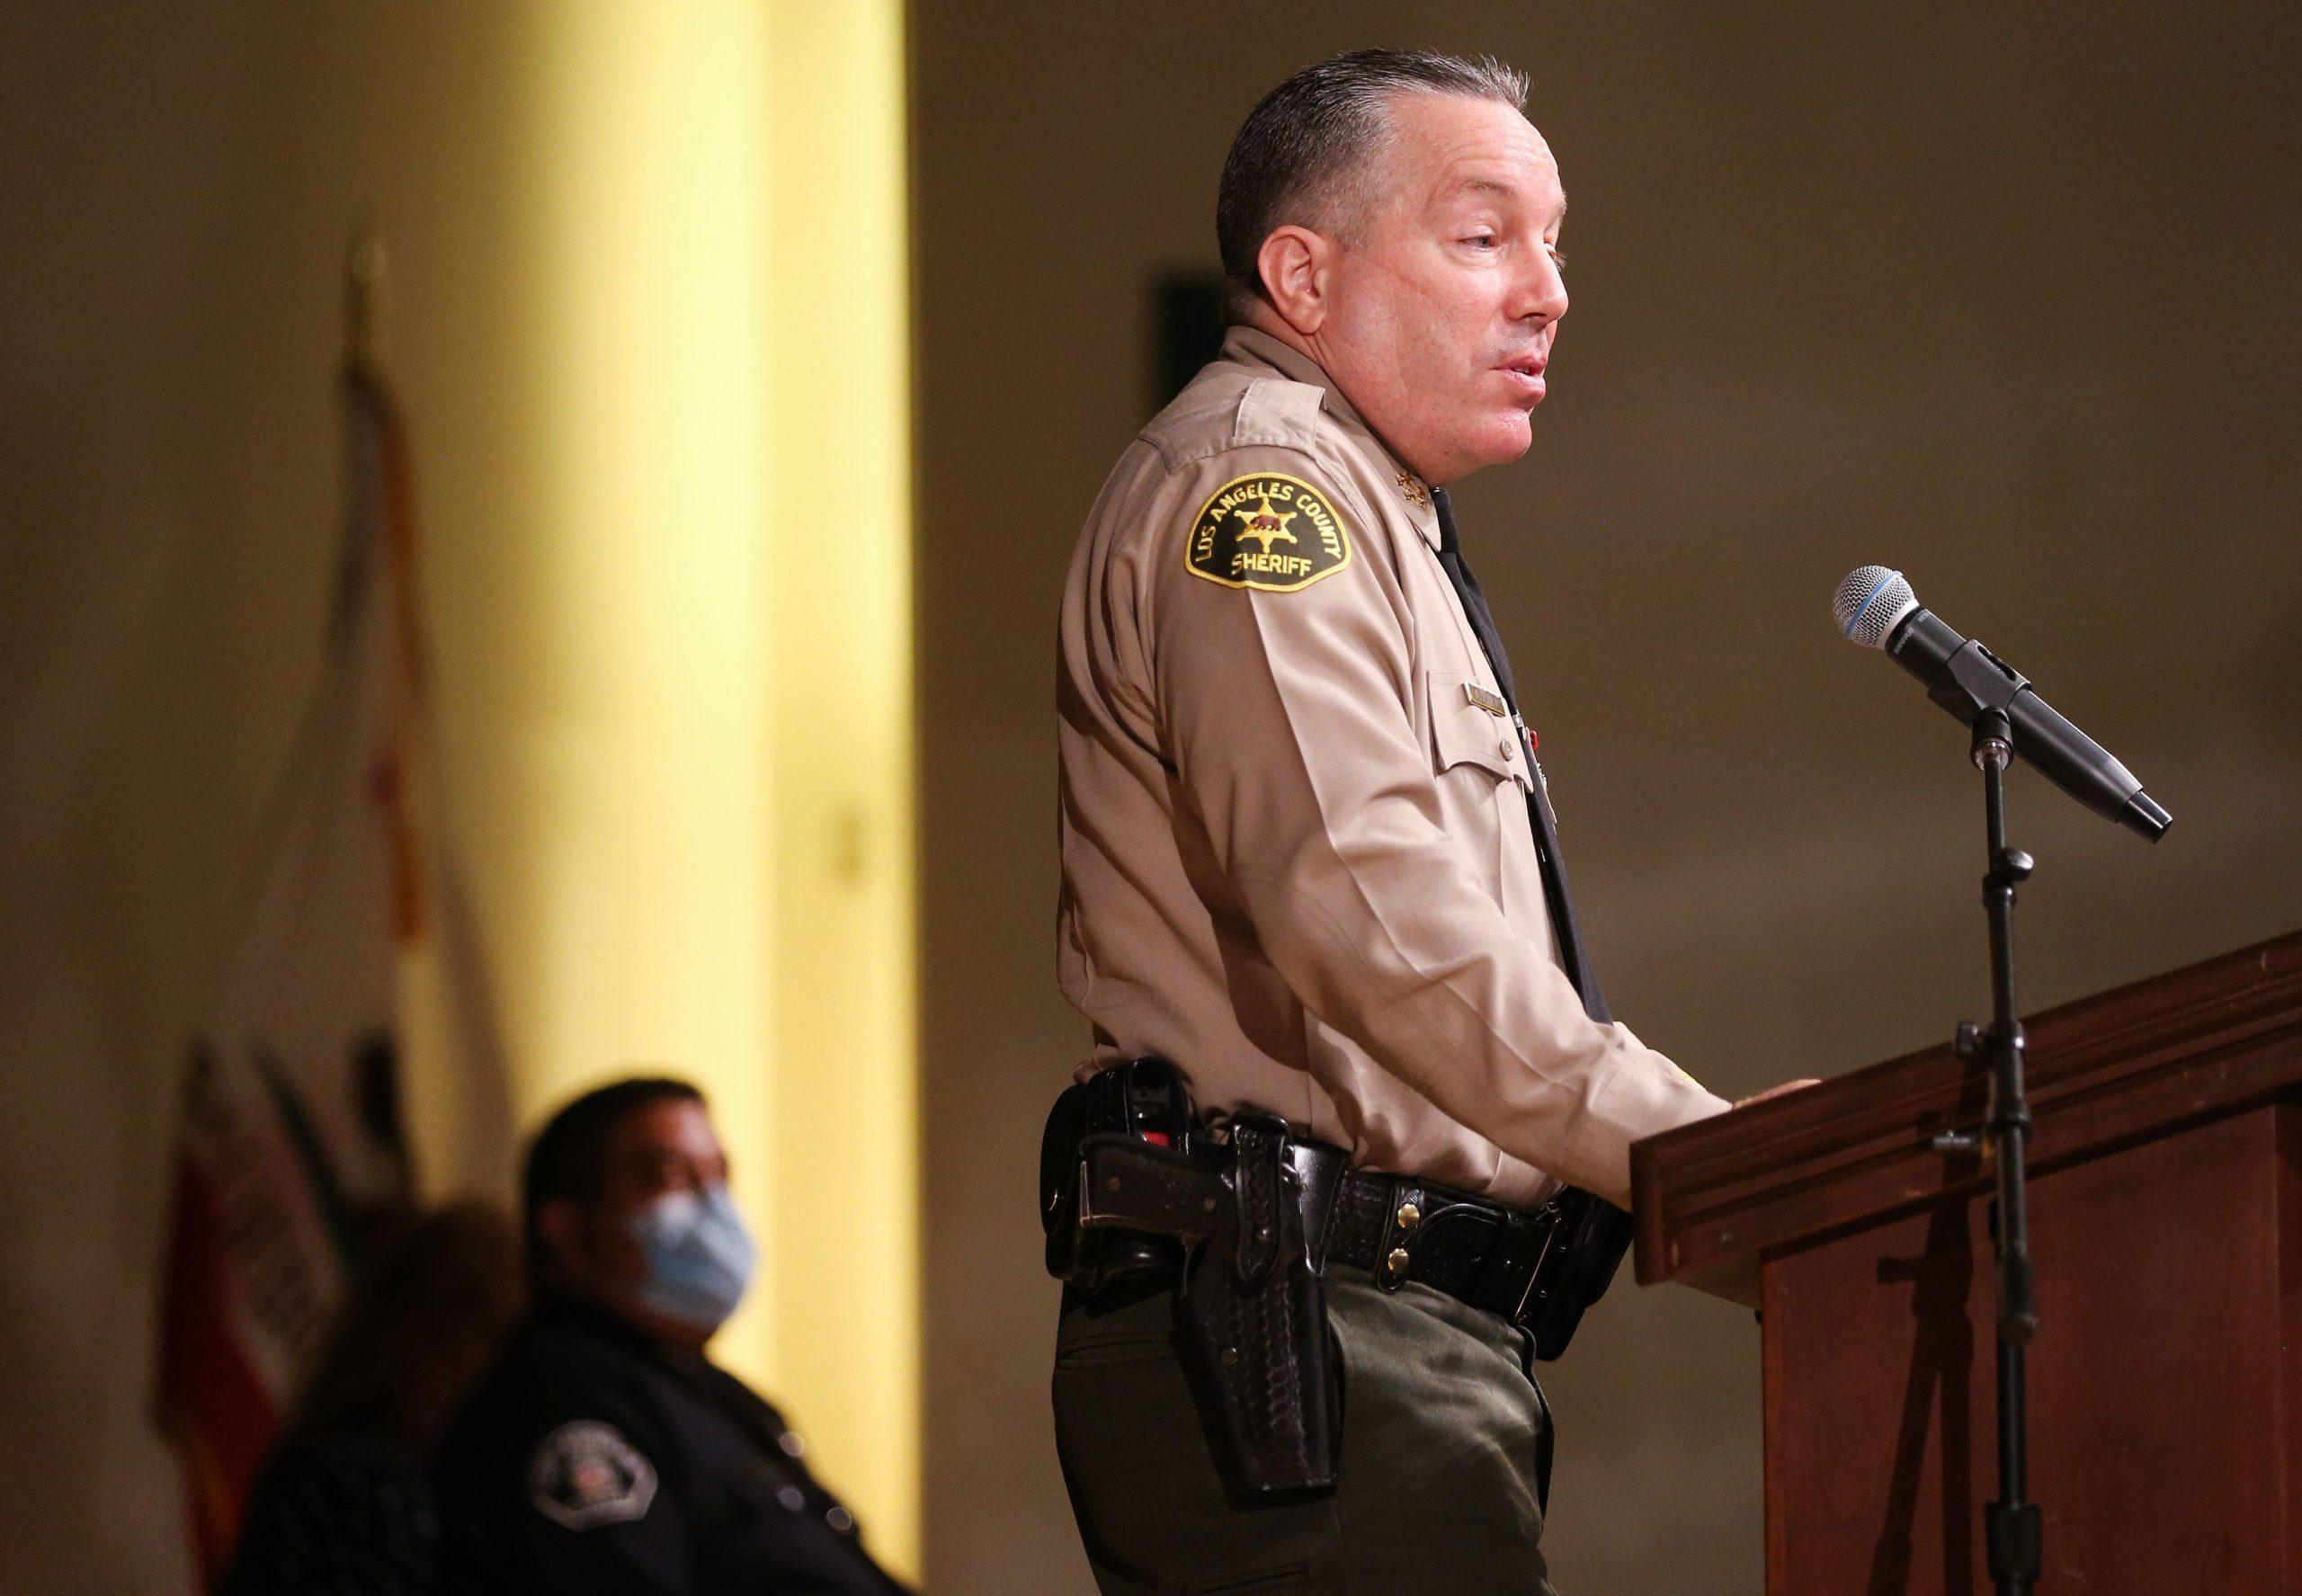 Los Angeles County Sheriff Alex Villanueva speaks on Aug. 21, 2020 in Monterey Park, California. (Mario Tama/Getty Images)